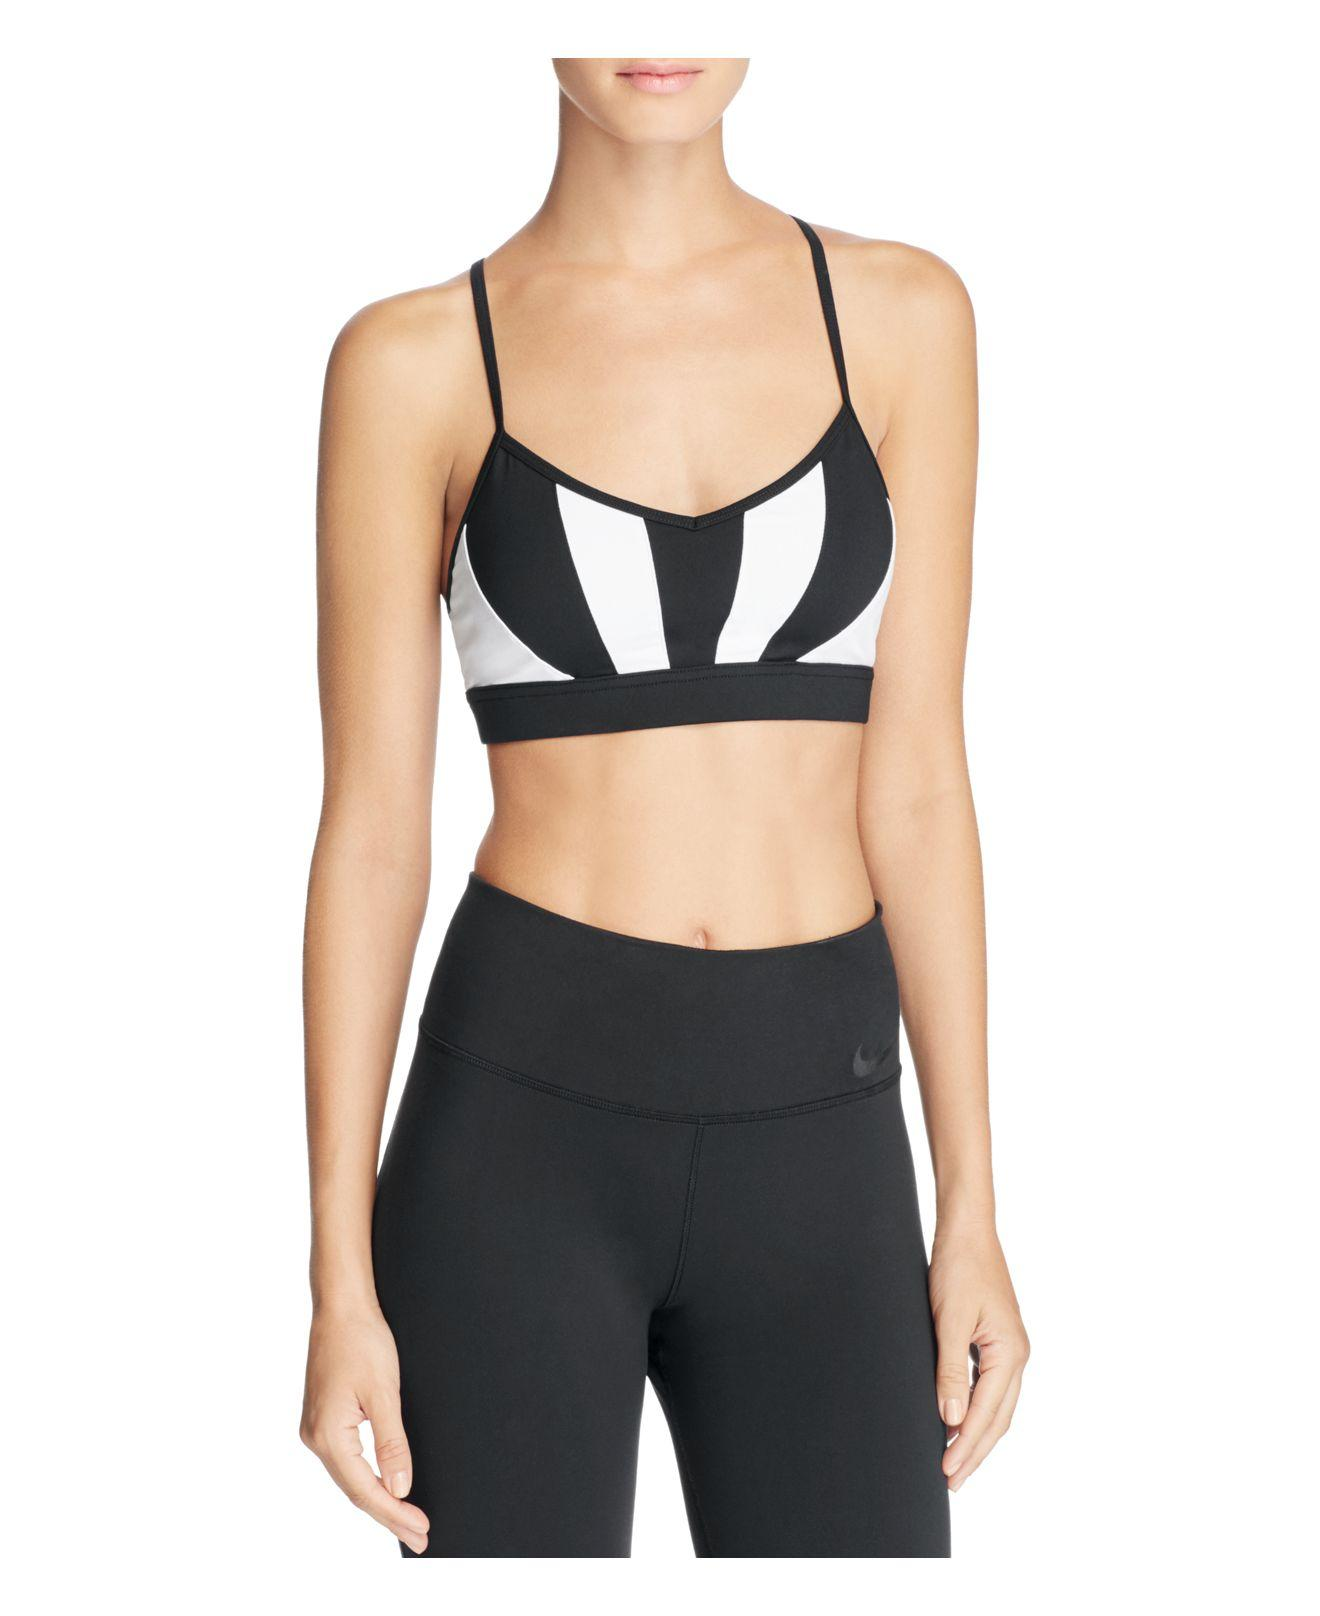 Alo Yoga Radiance Sports Bra In Black